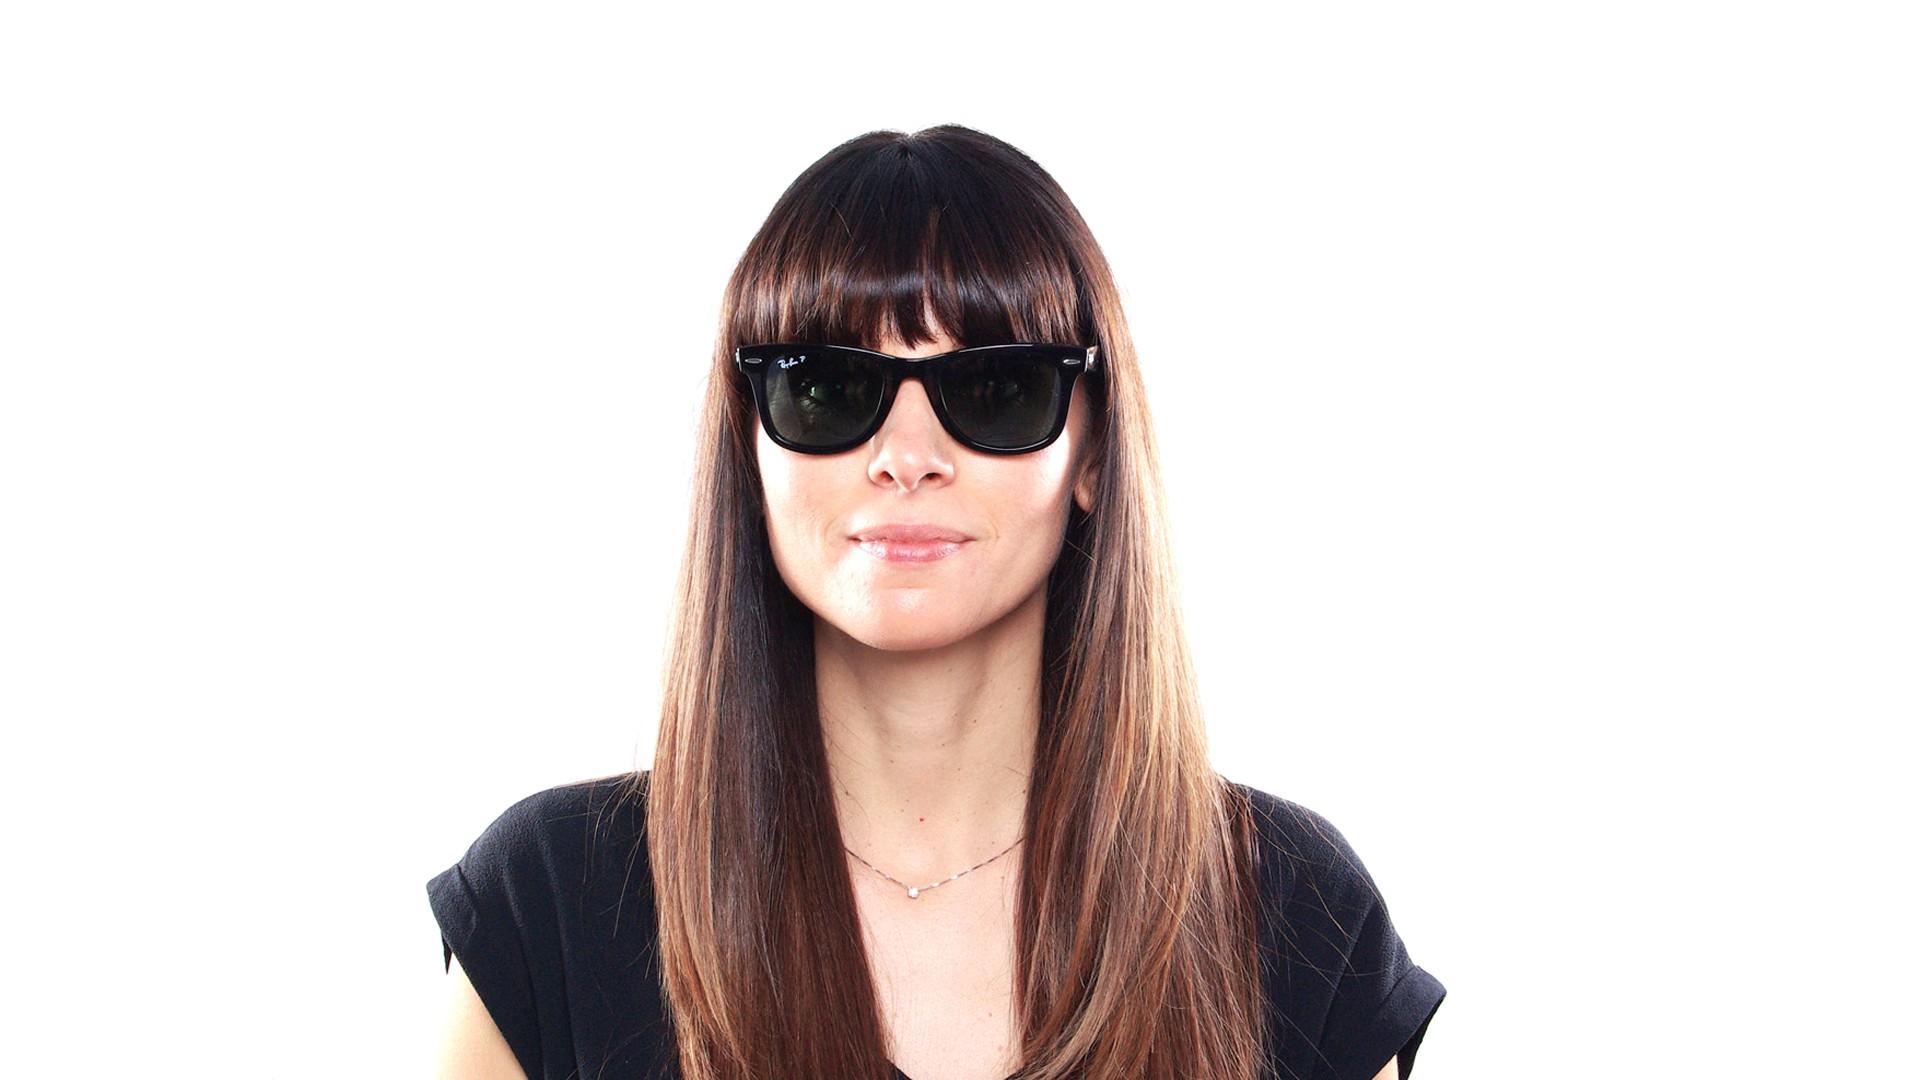 996a09cc89 Sunglasses Ray-Ban Wayfarer Ease Black RB4340 601 58 50-22 Medium Polarized